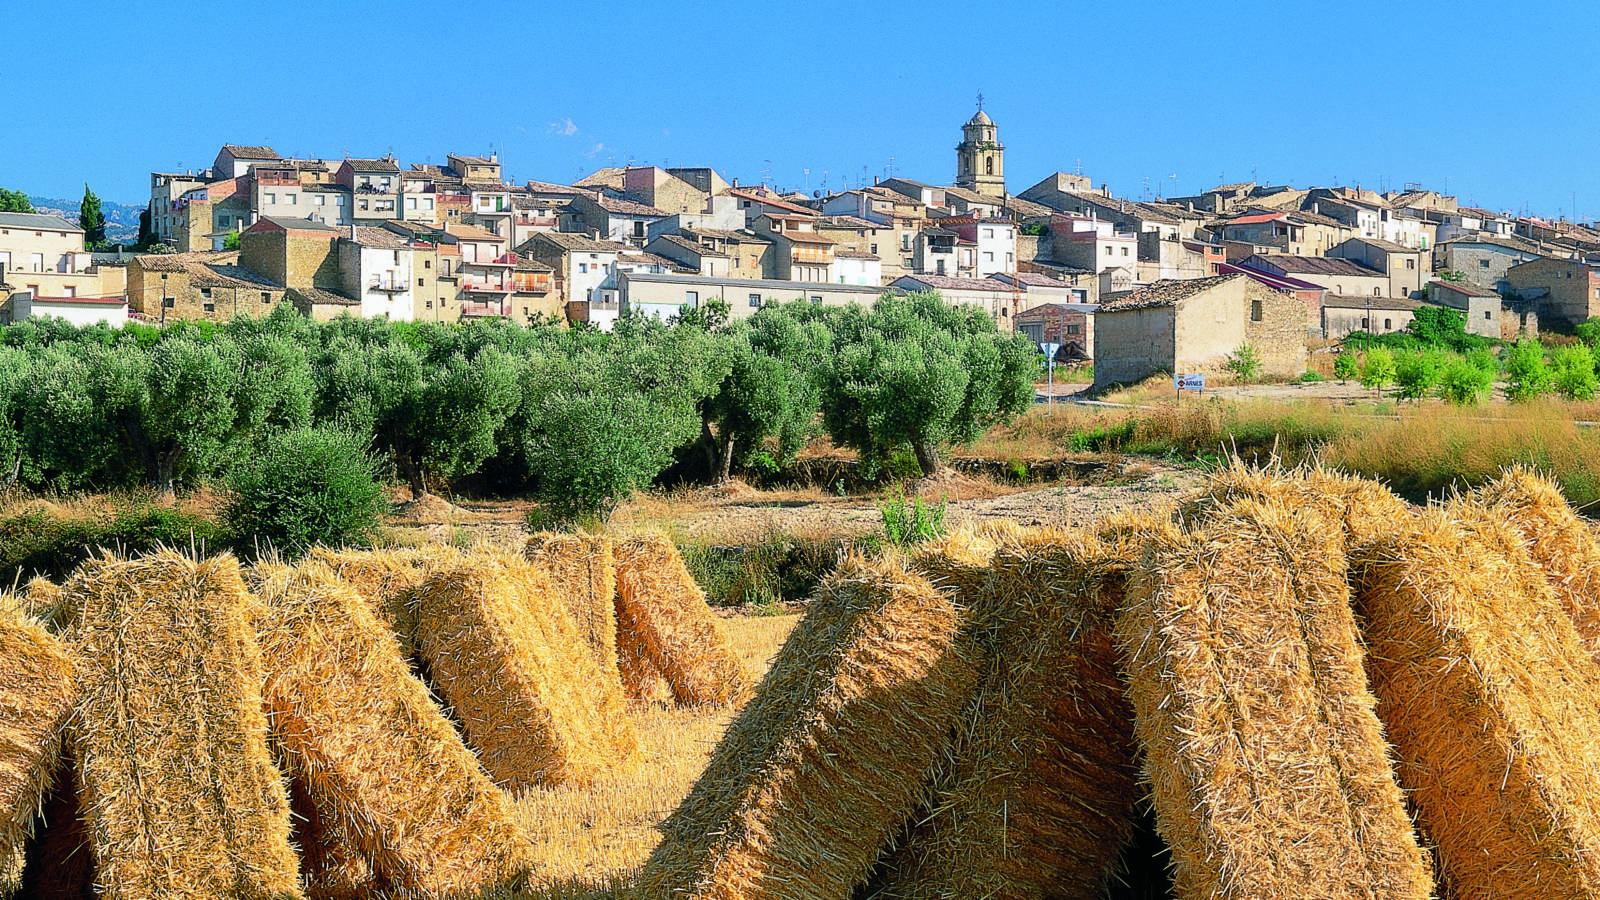 Arnes, Ebrodelta